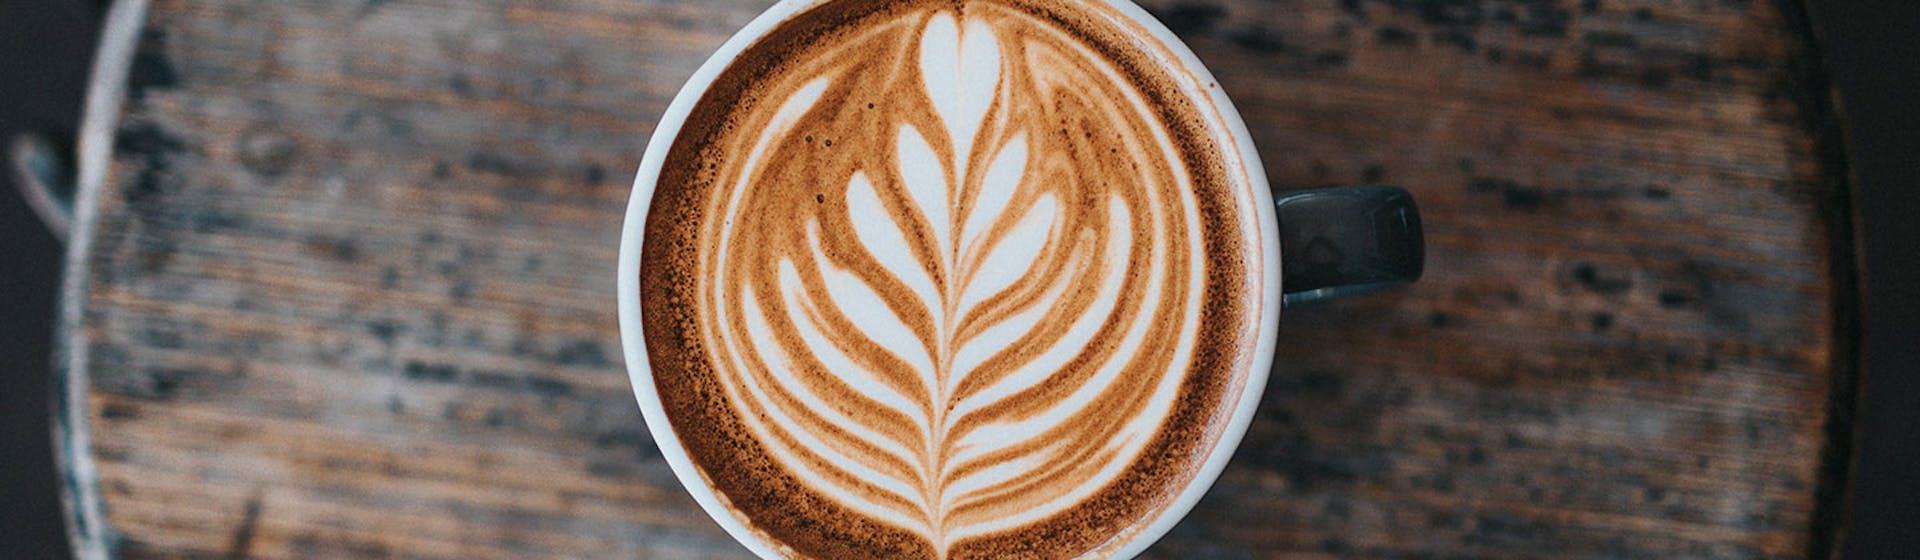 10 bebidas de café dignas de competir con Starbucks